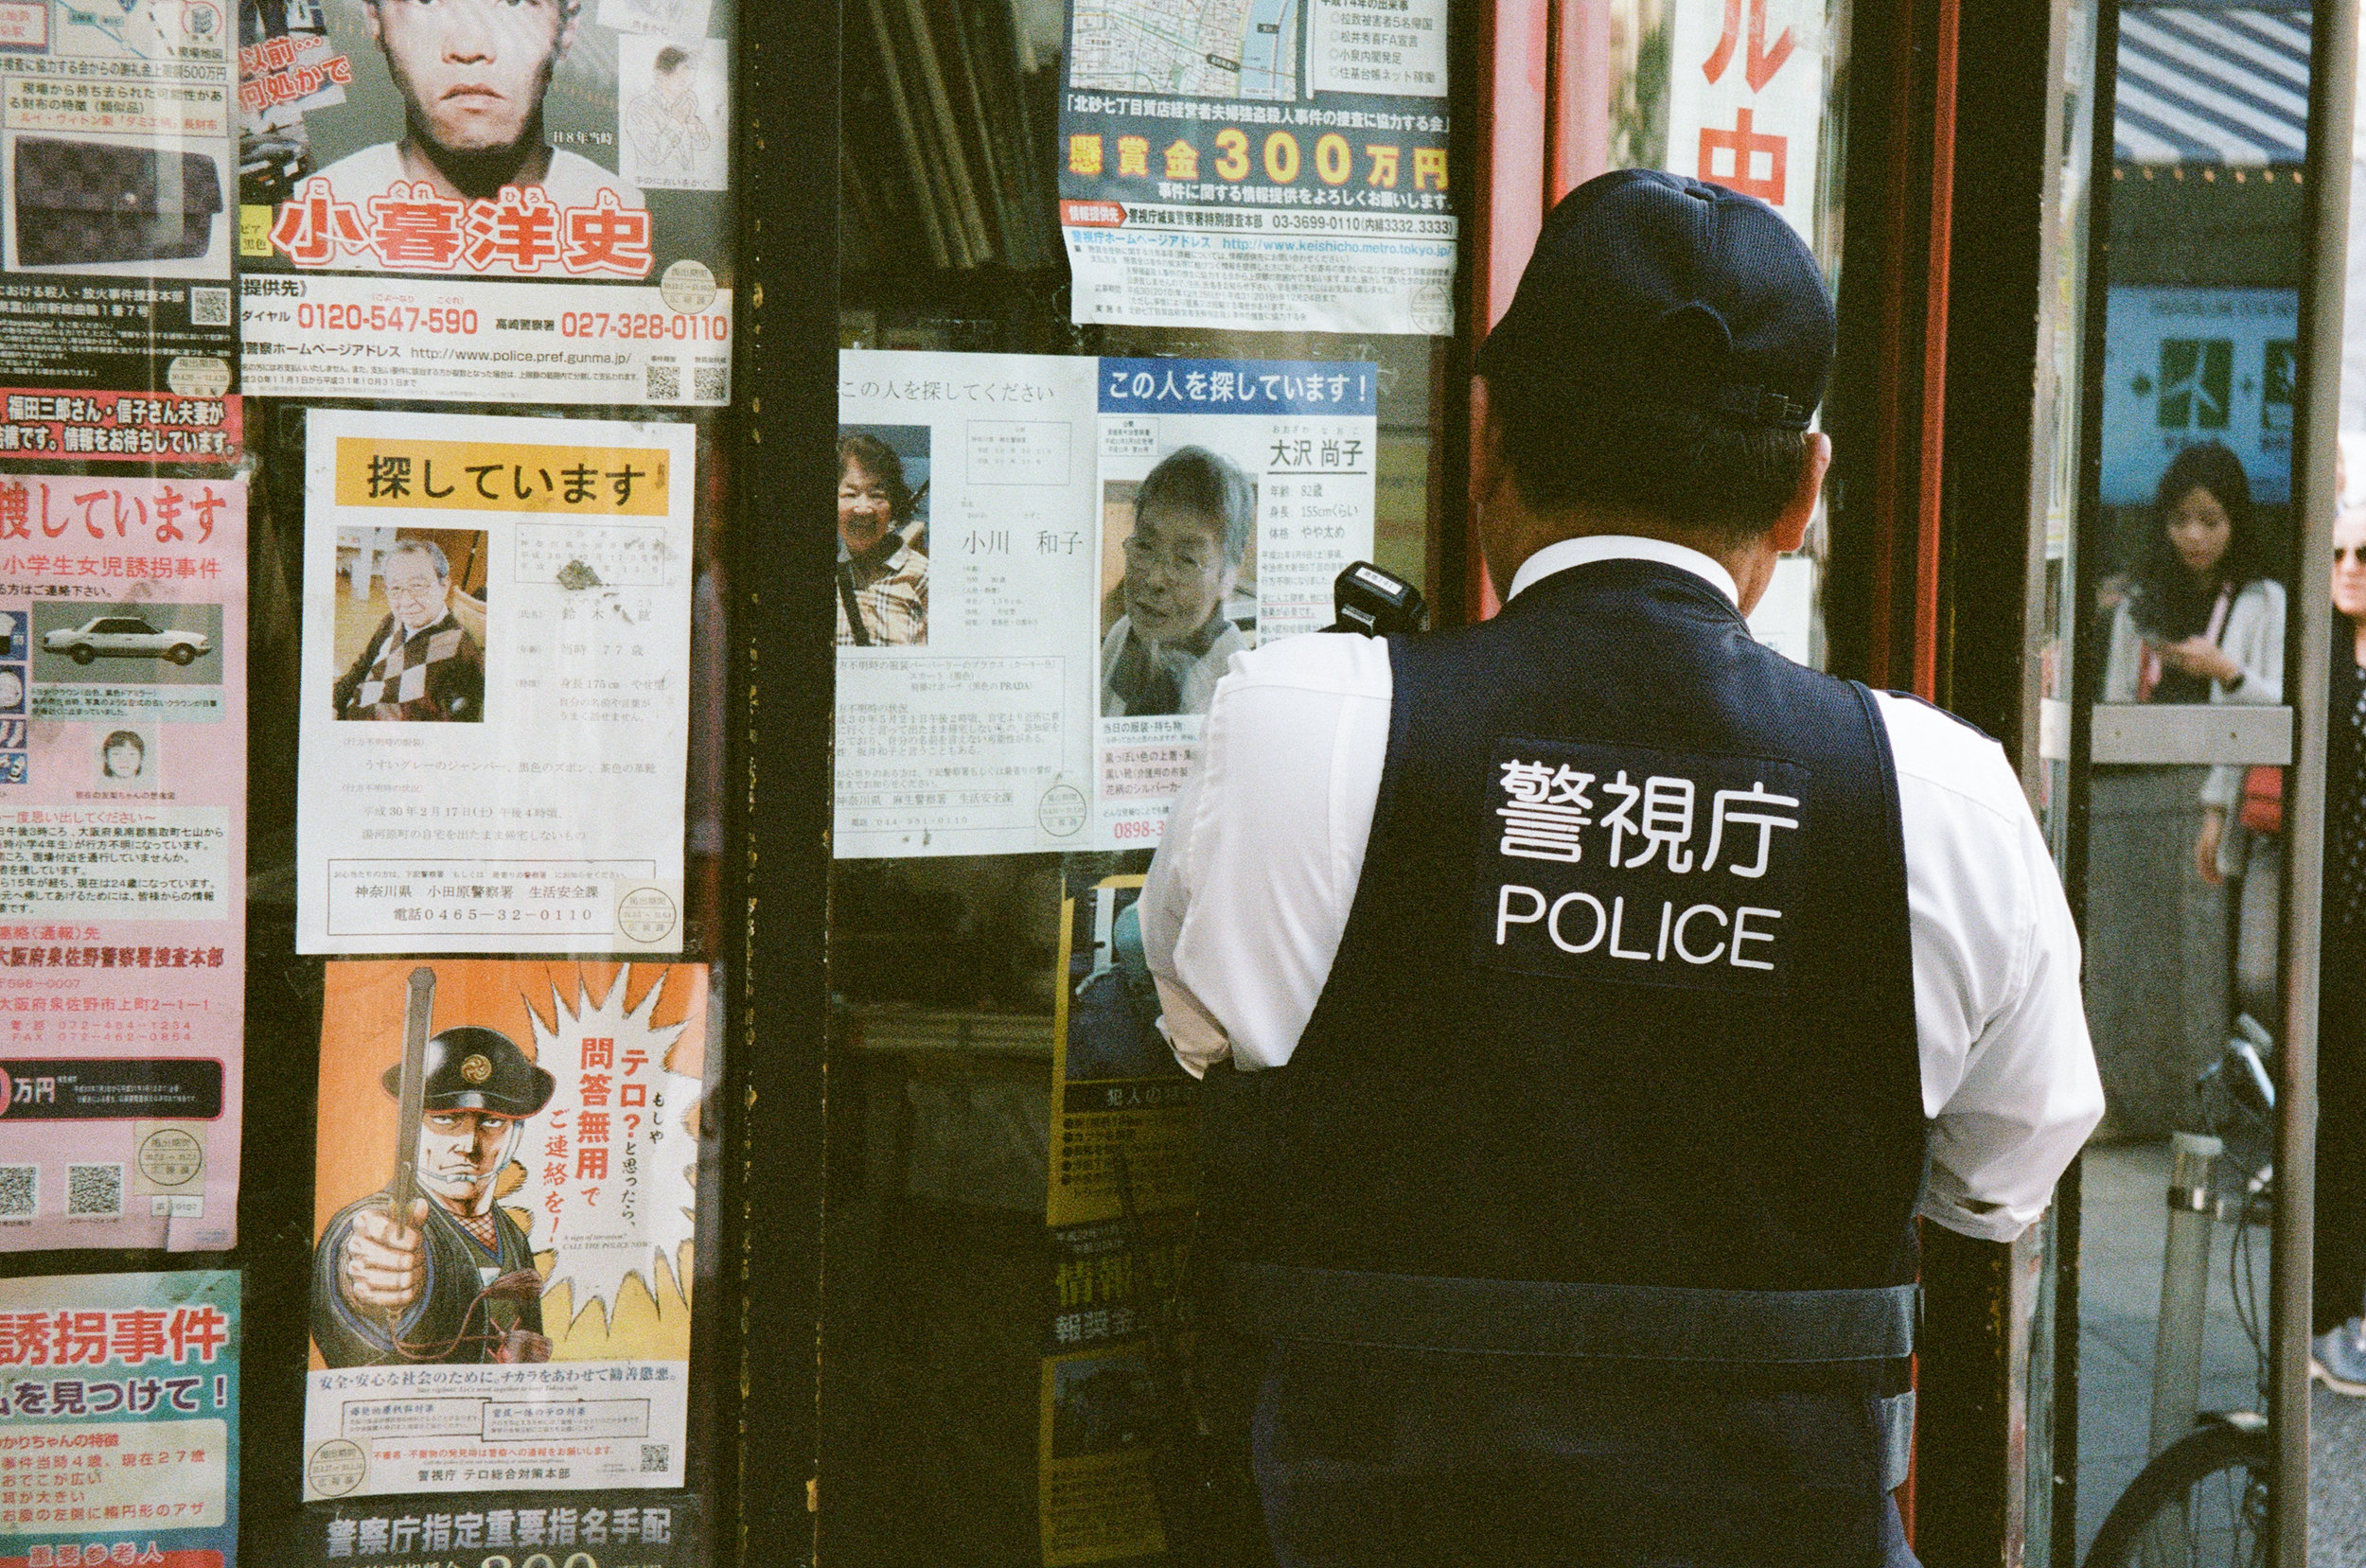 Japan_35mm-27.jpg